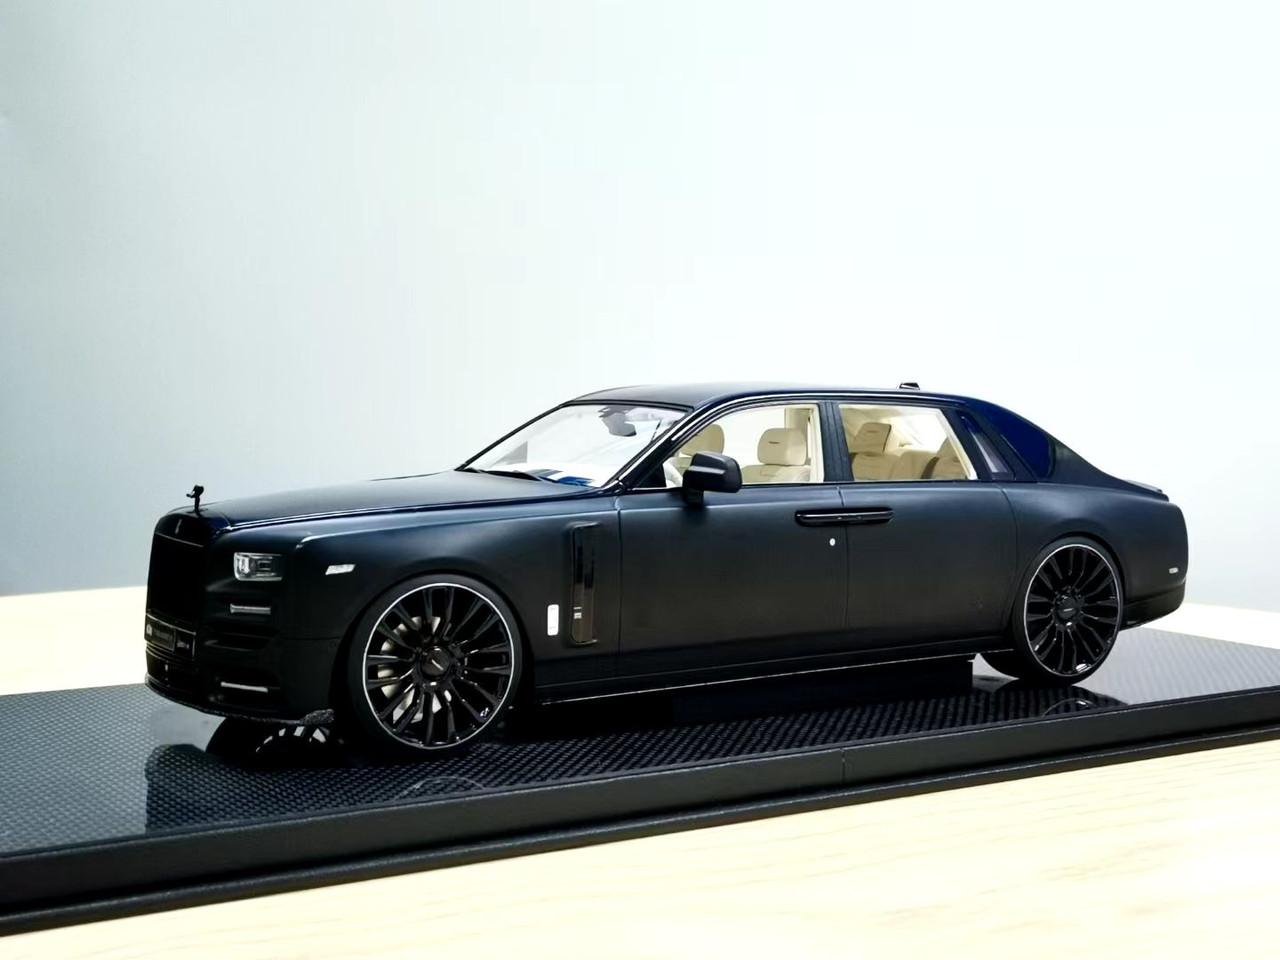 1 18 Mansory Rolls Royce Rr Phantom Viii Matte Black Resin Car Model Limited 99 Pieces Livecarmodel Com